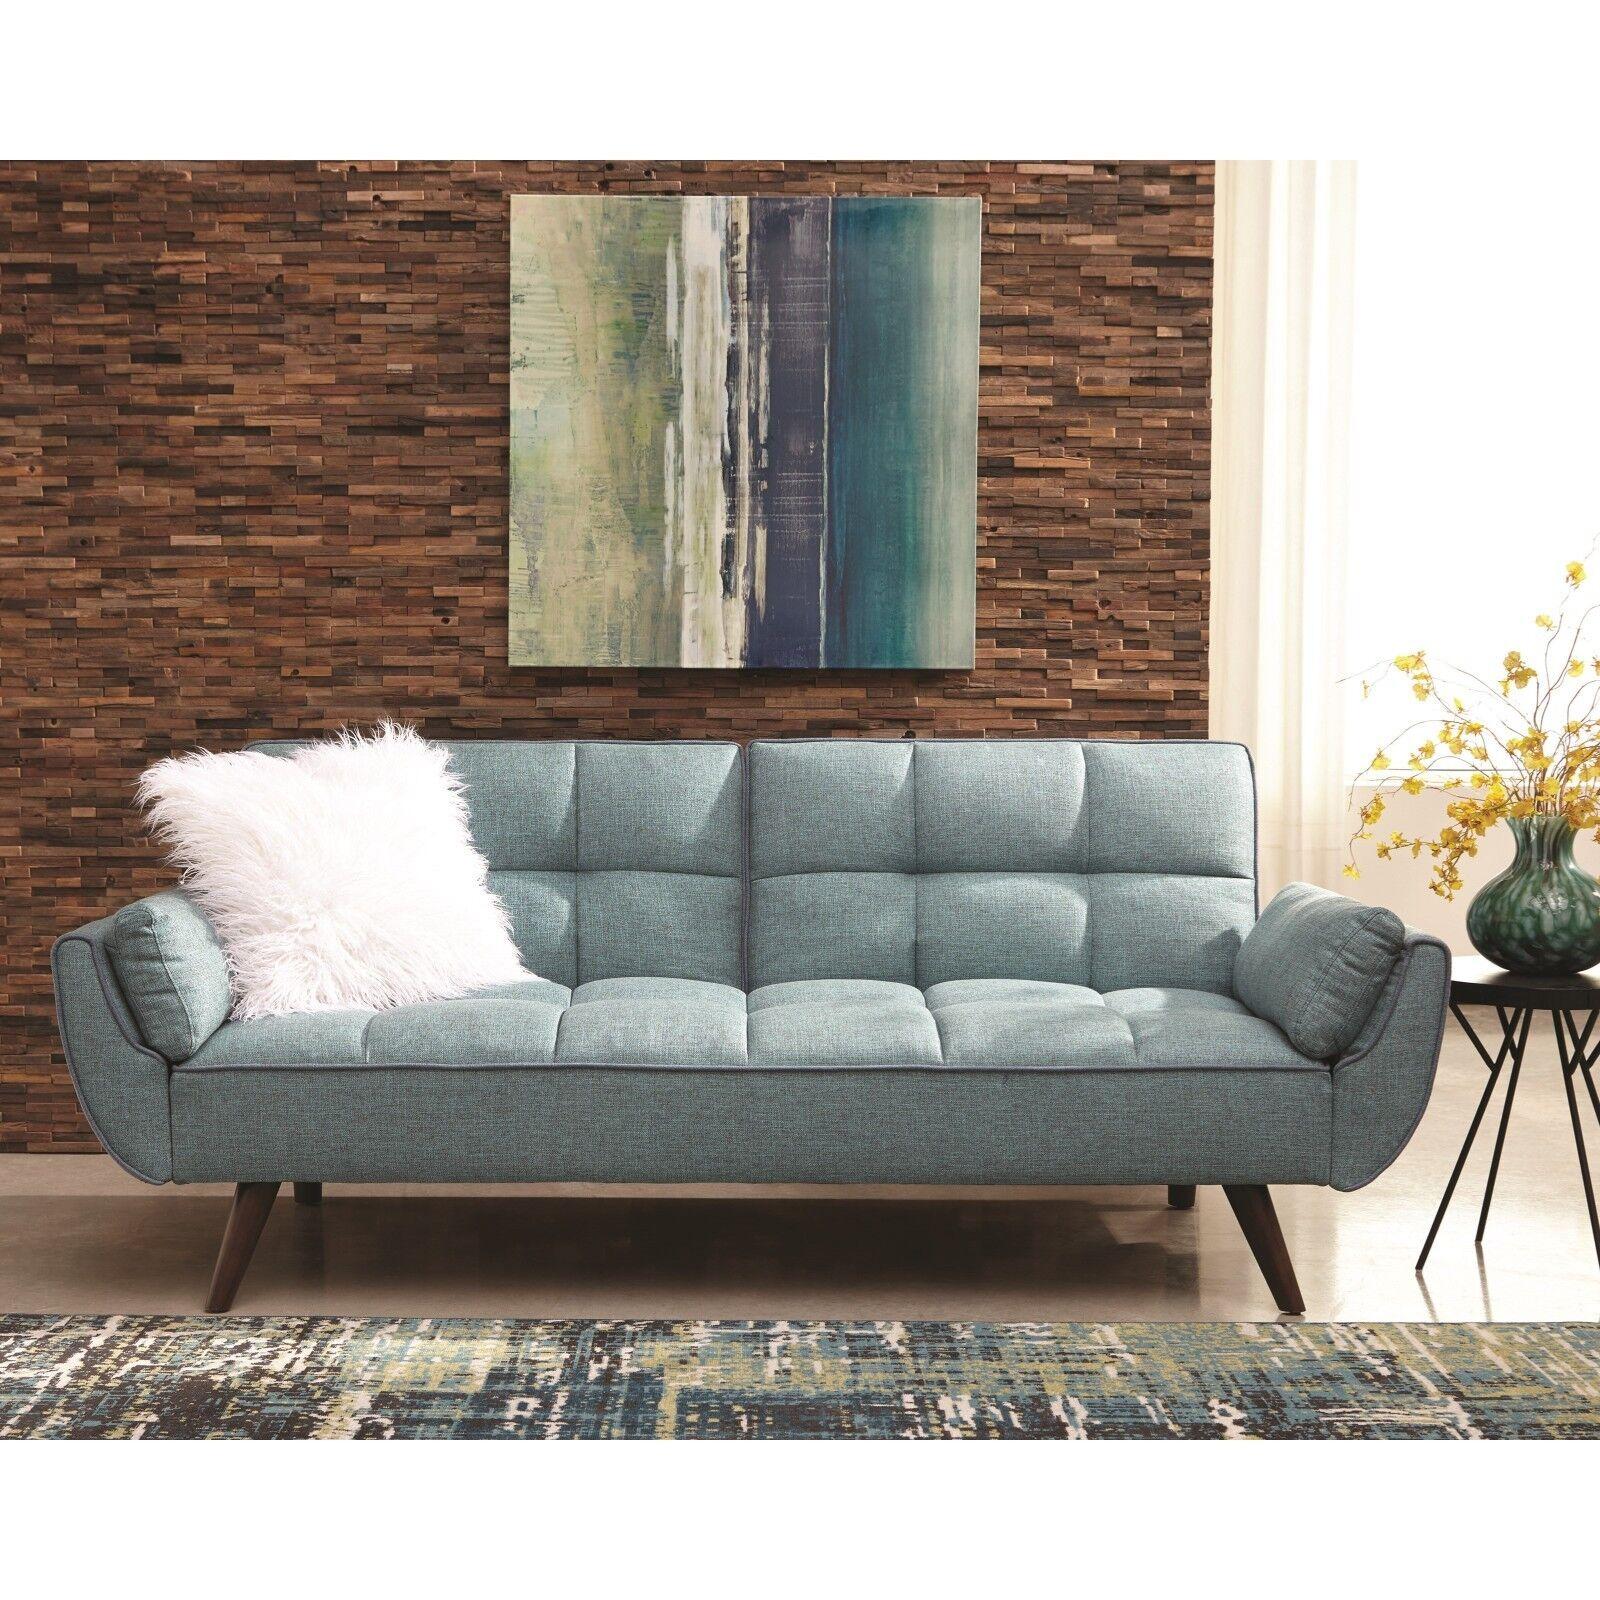 Turquoise Blue Woven Sofa Bed Futon